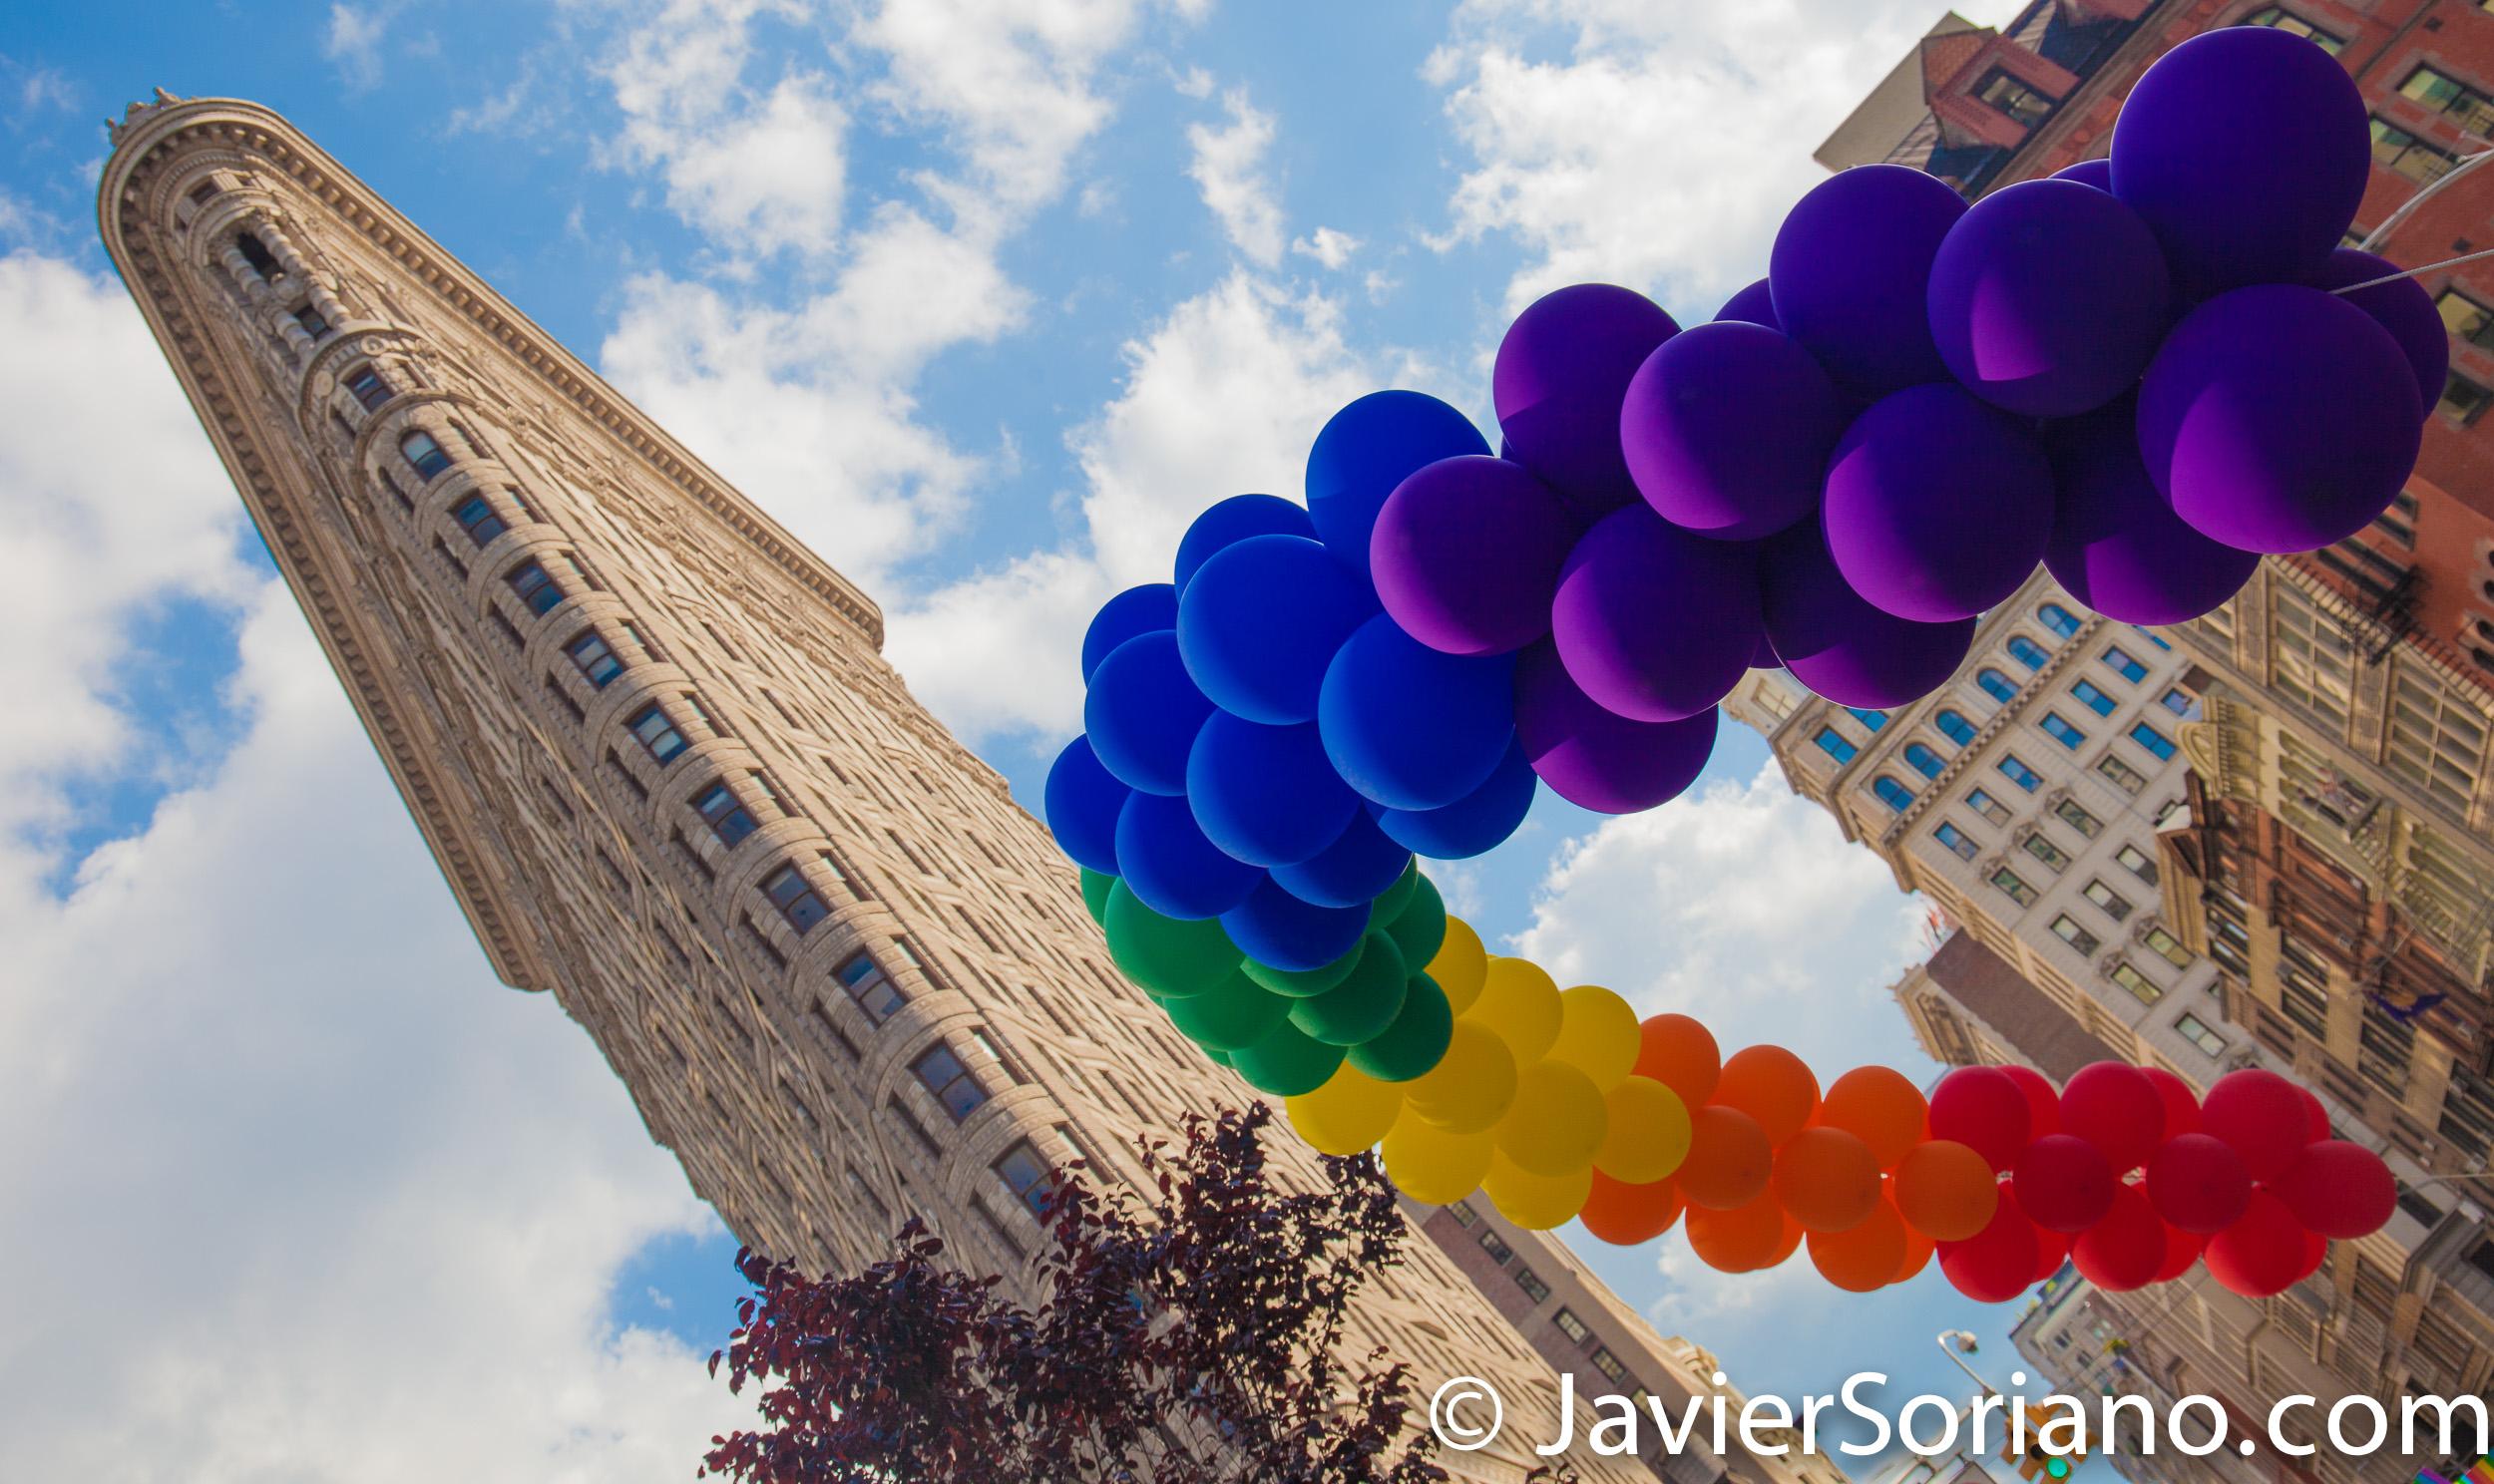 June 25, 2017. Manhattan, New York City - Pride March. Photo by Javier Soriano/www.JavierSoriano.com